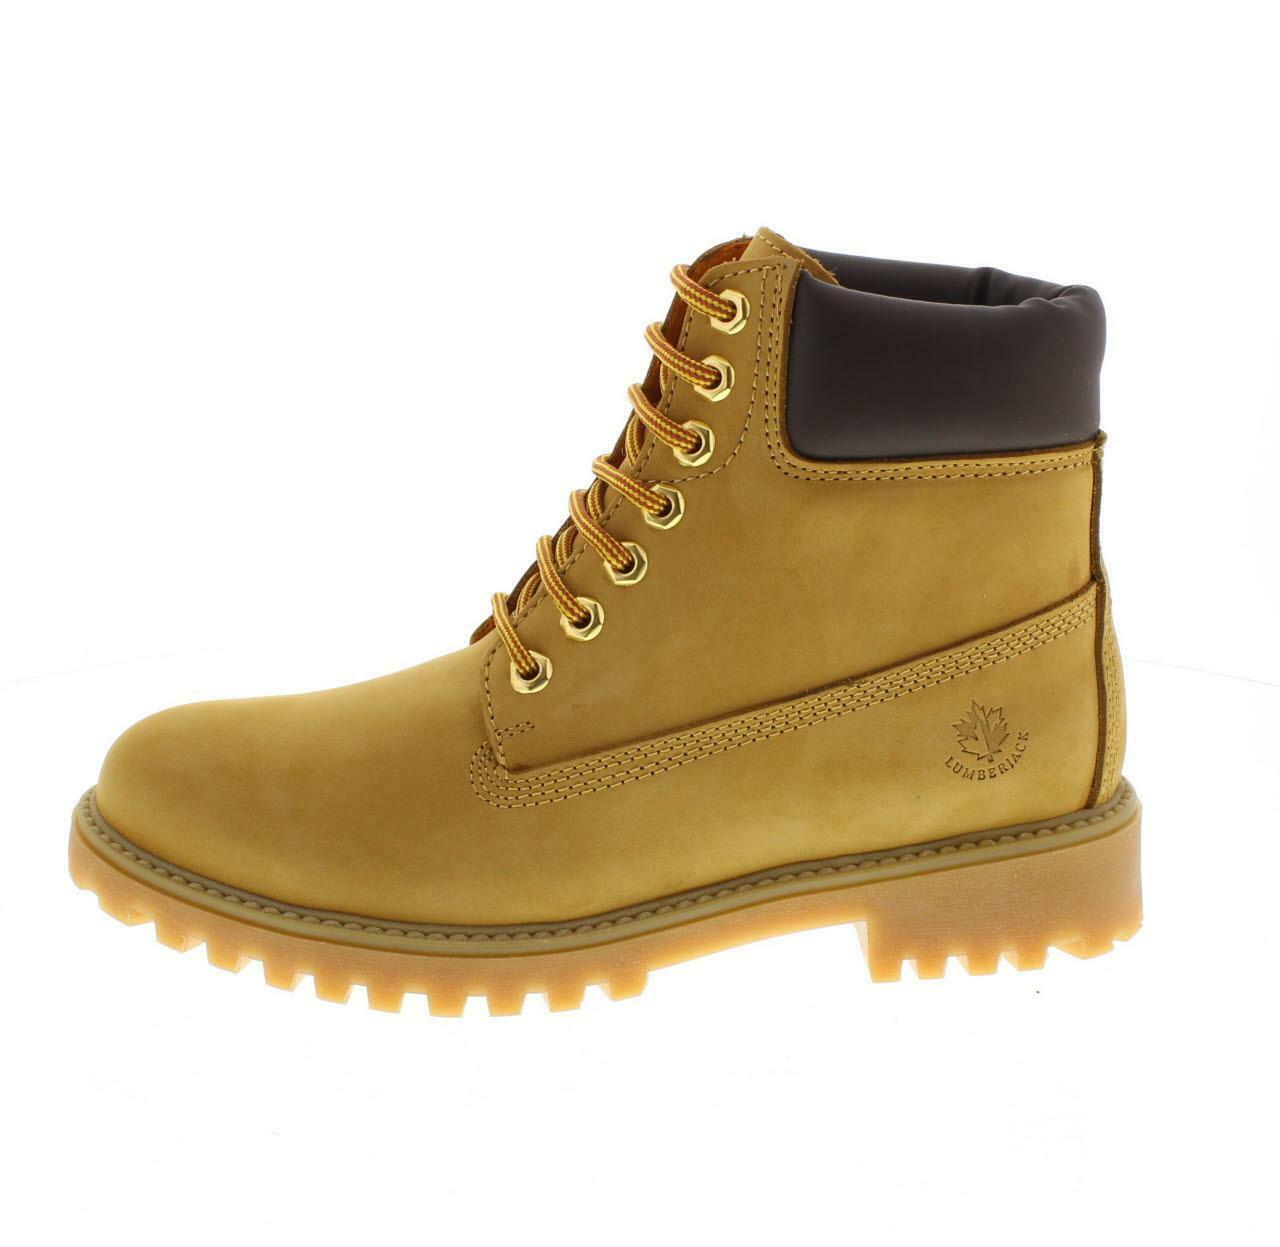 lumberjack scarponcino uomo sm00101-023 d01 giallo